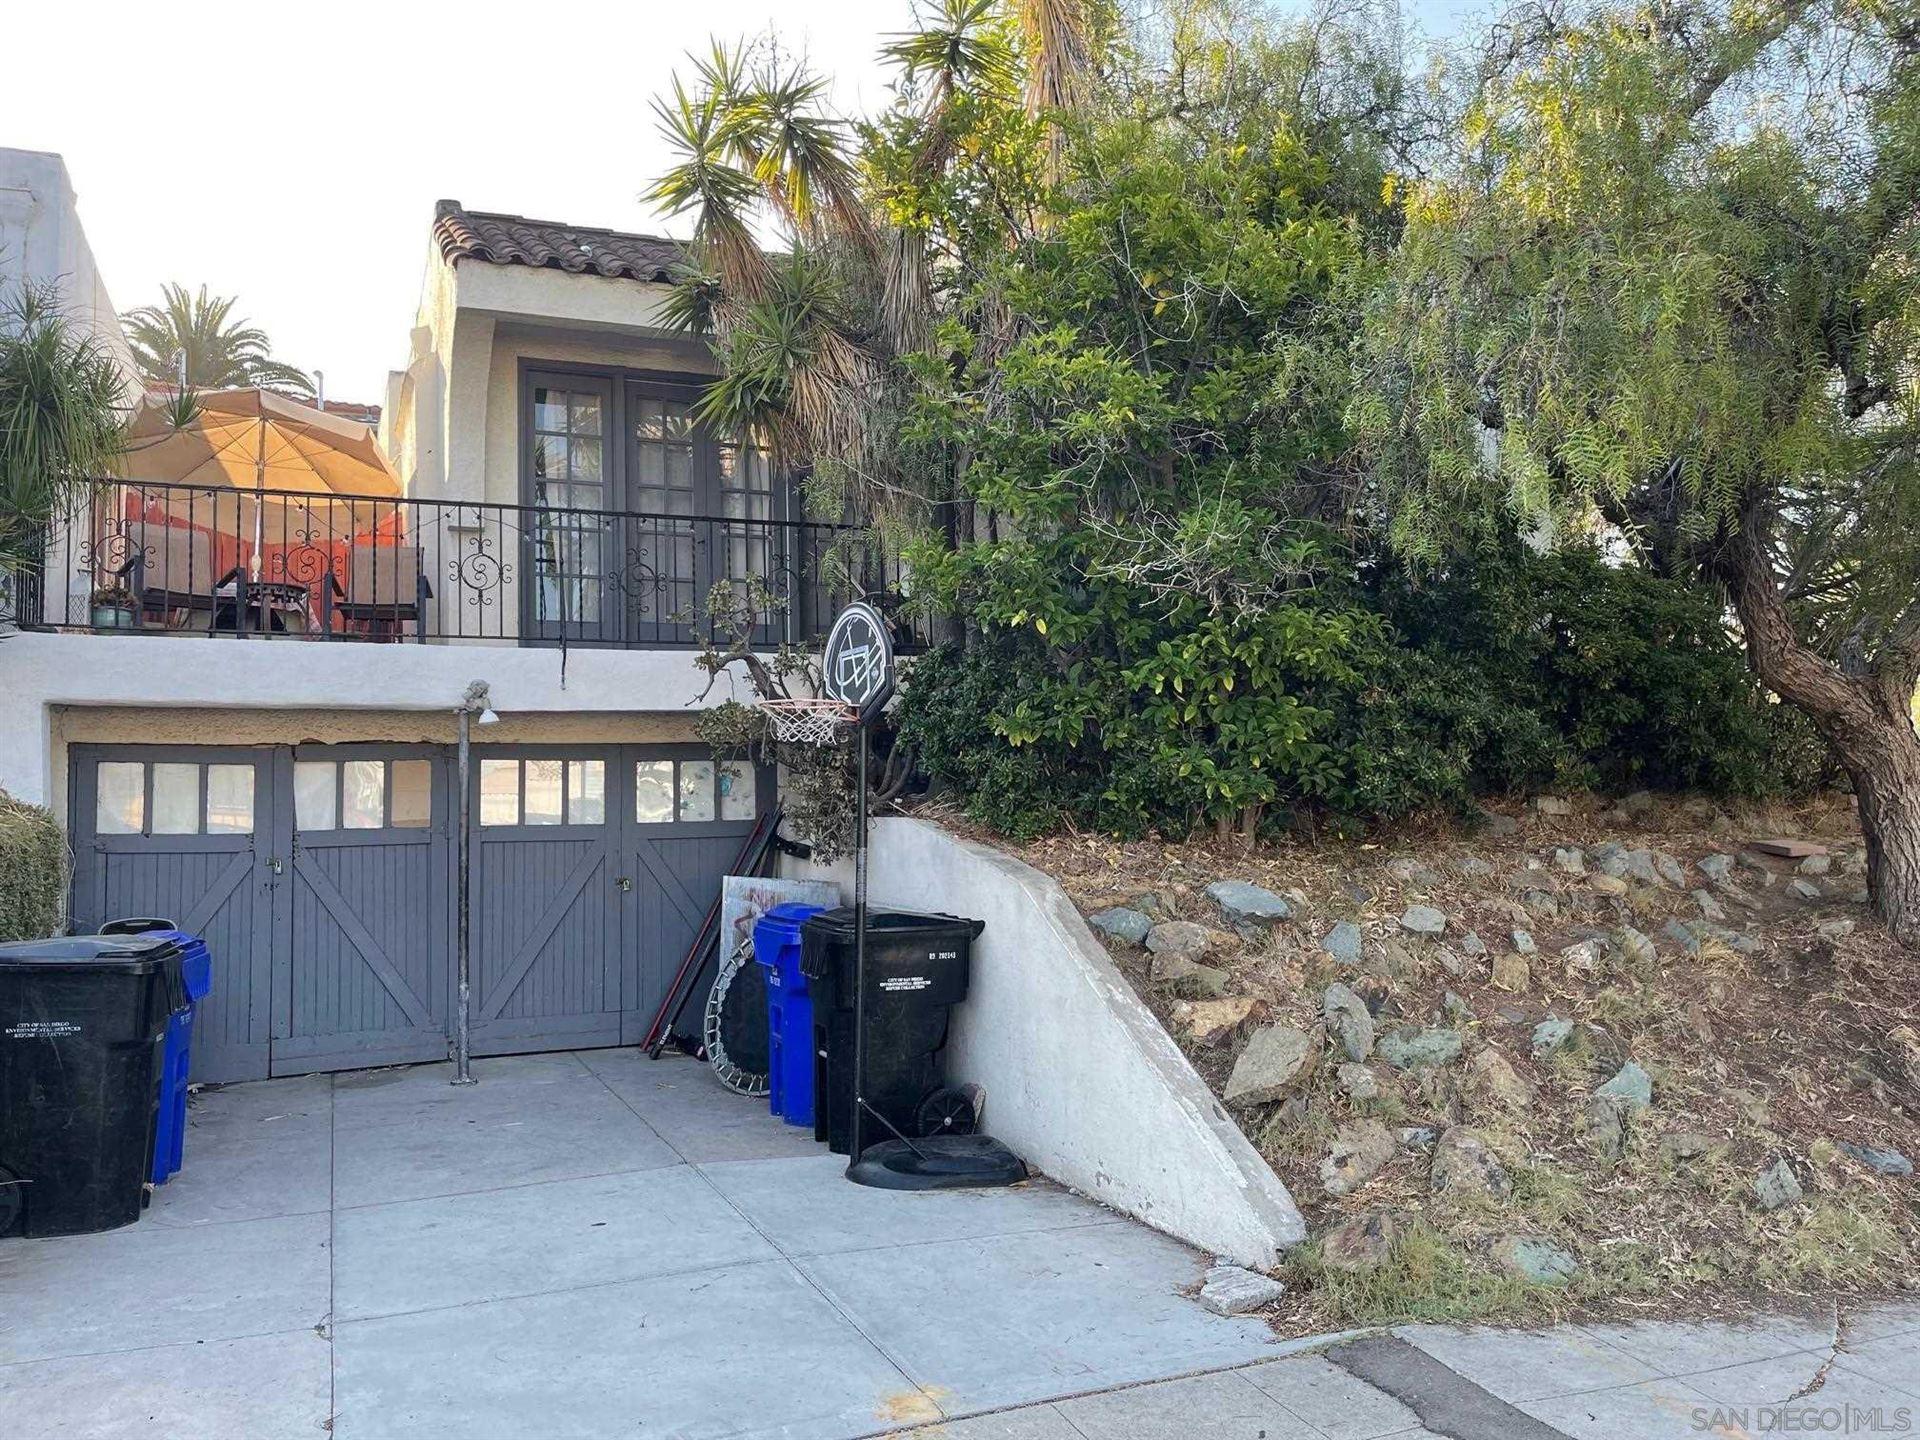 Photo of 2902 A St, San Diego, CA 92102 (MLS # 210020327)